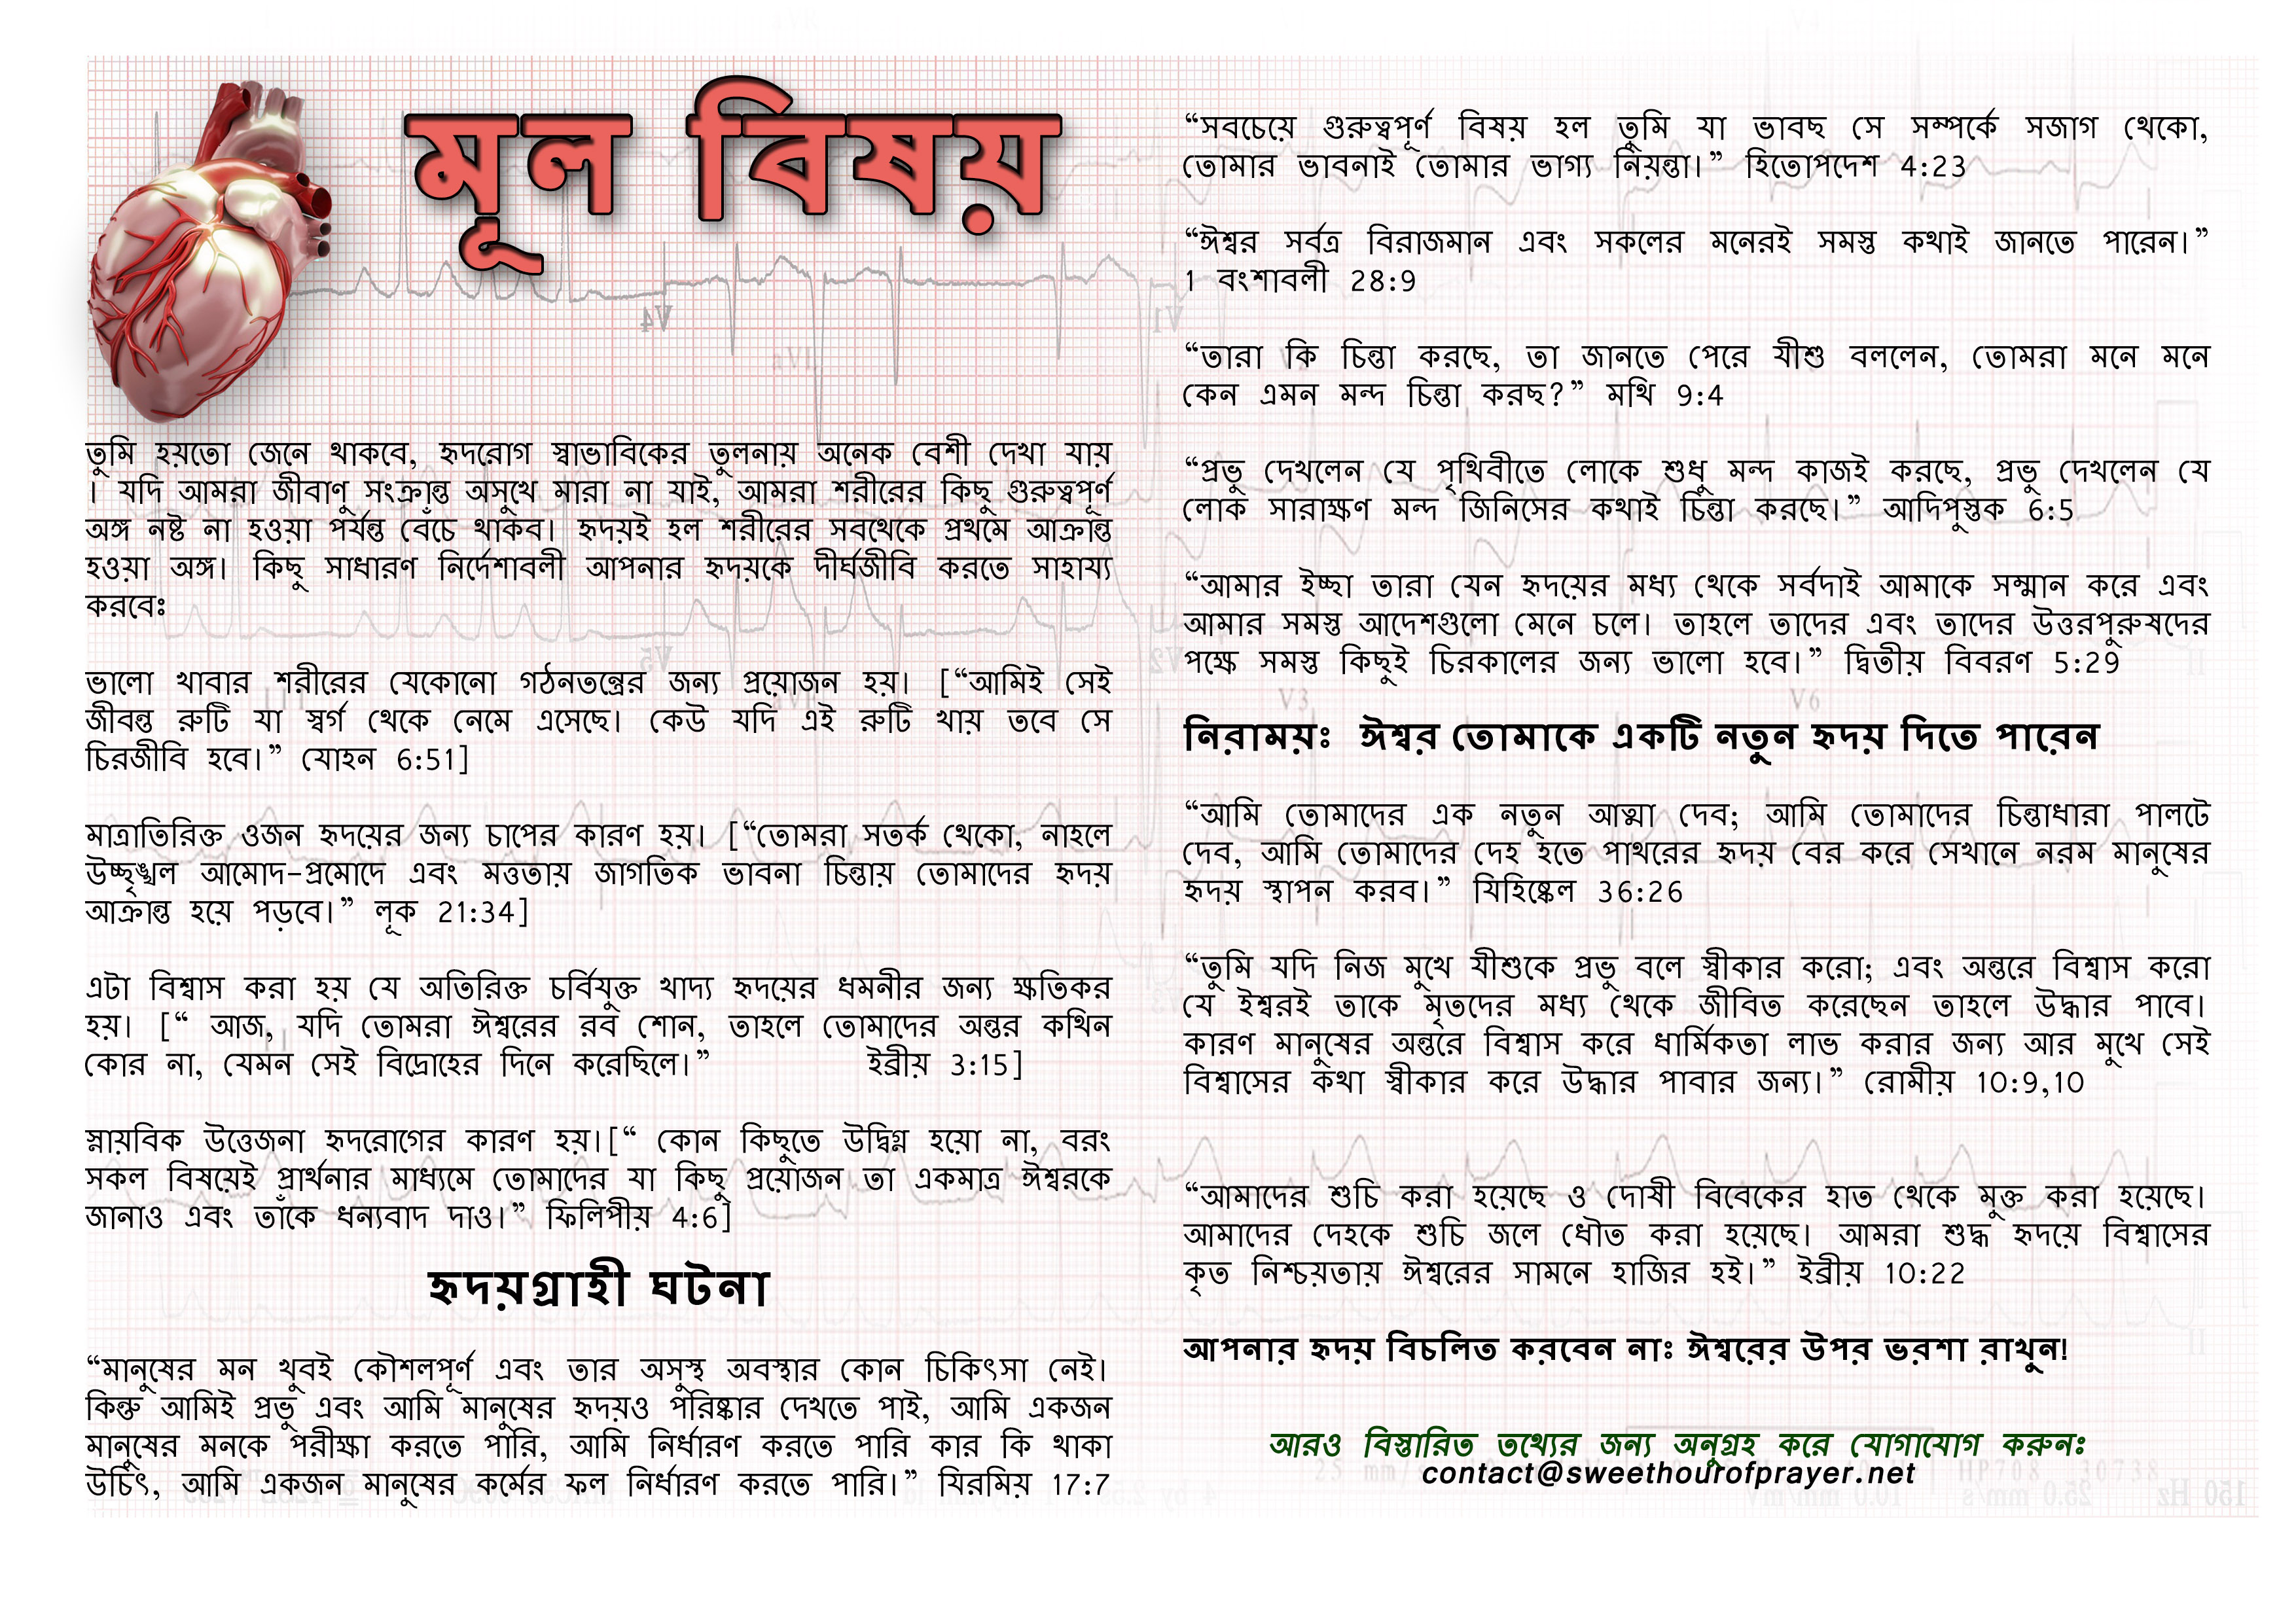 Heart of the matter bengali